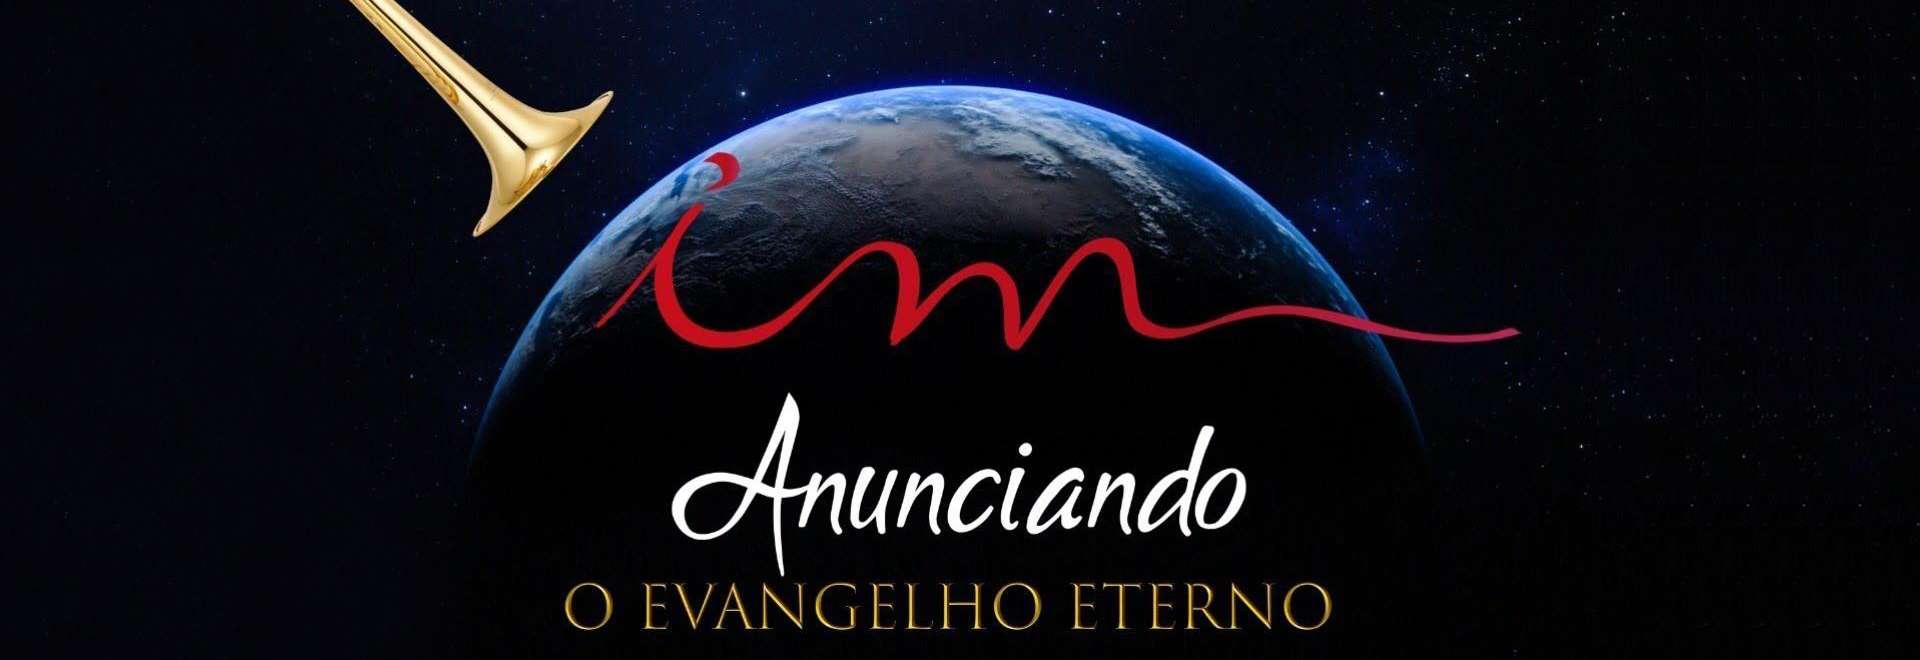 Igreja Cristã Maranata exibe programa de TV em seis cidades de Massachusetts, EUA